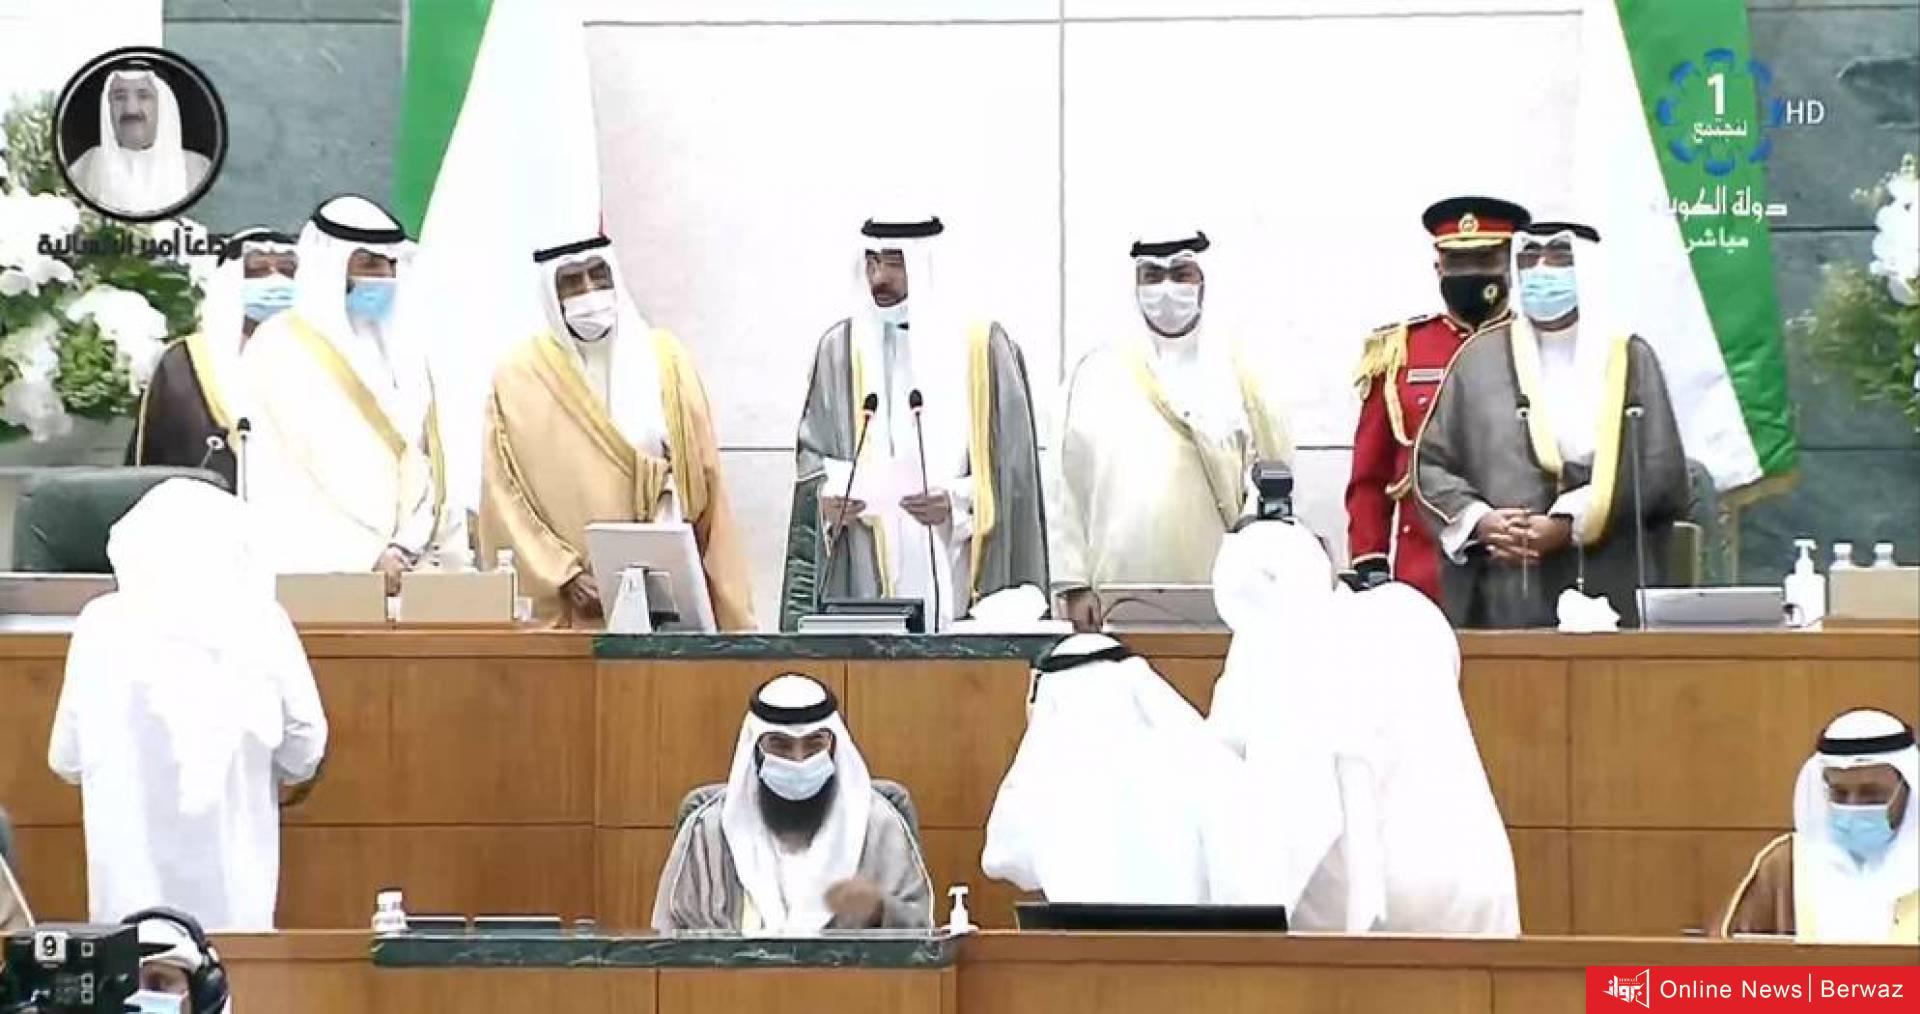 111111111111111 675048 highres - سمو الأمير: الانتخابات المقبلة مسؤولية وطنية لضمان سلامة أداء البرلمان